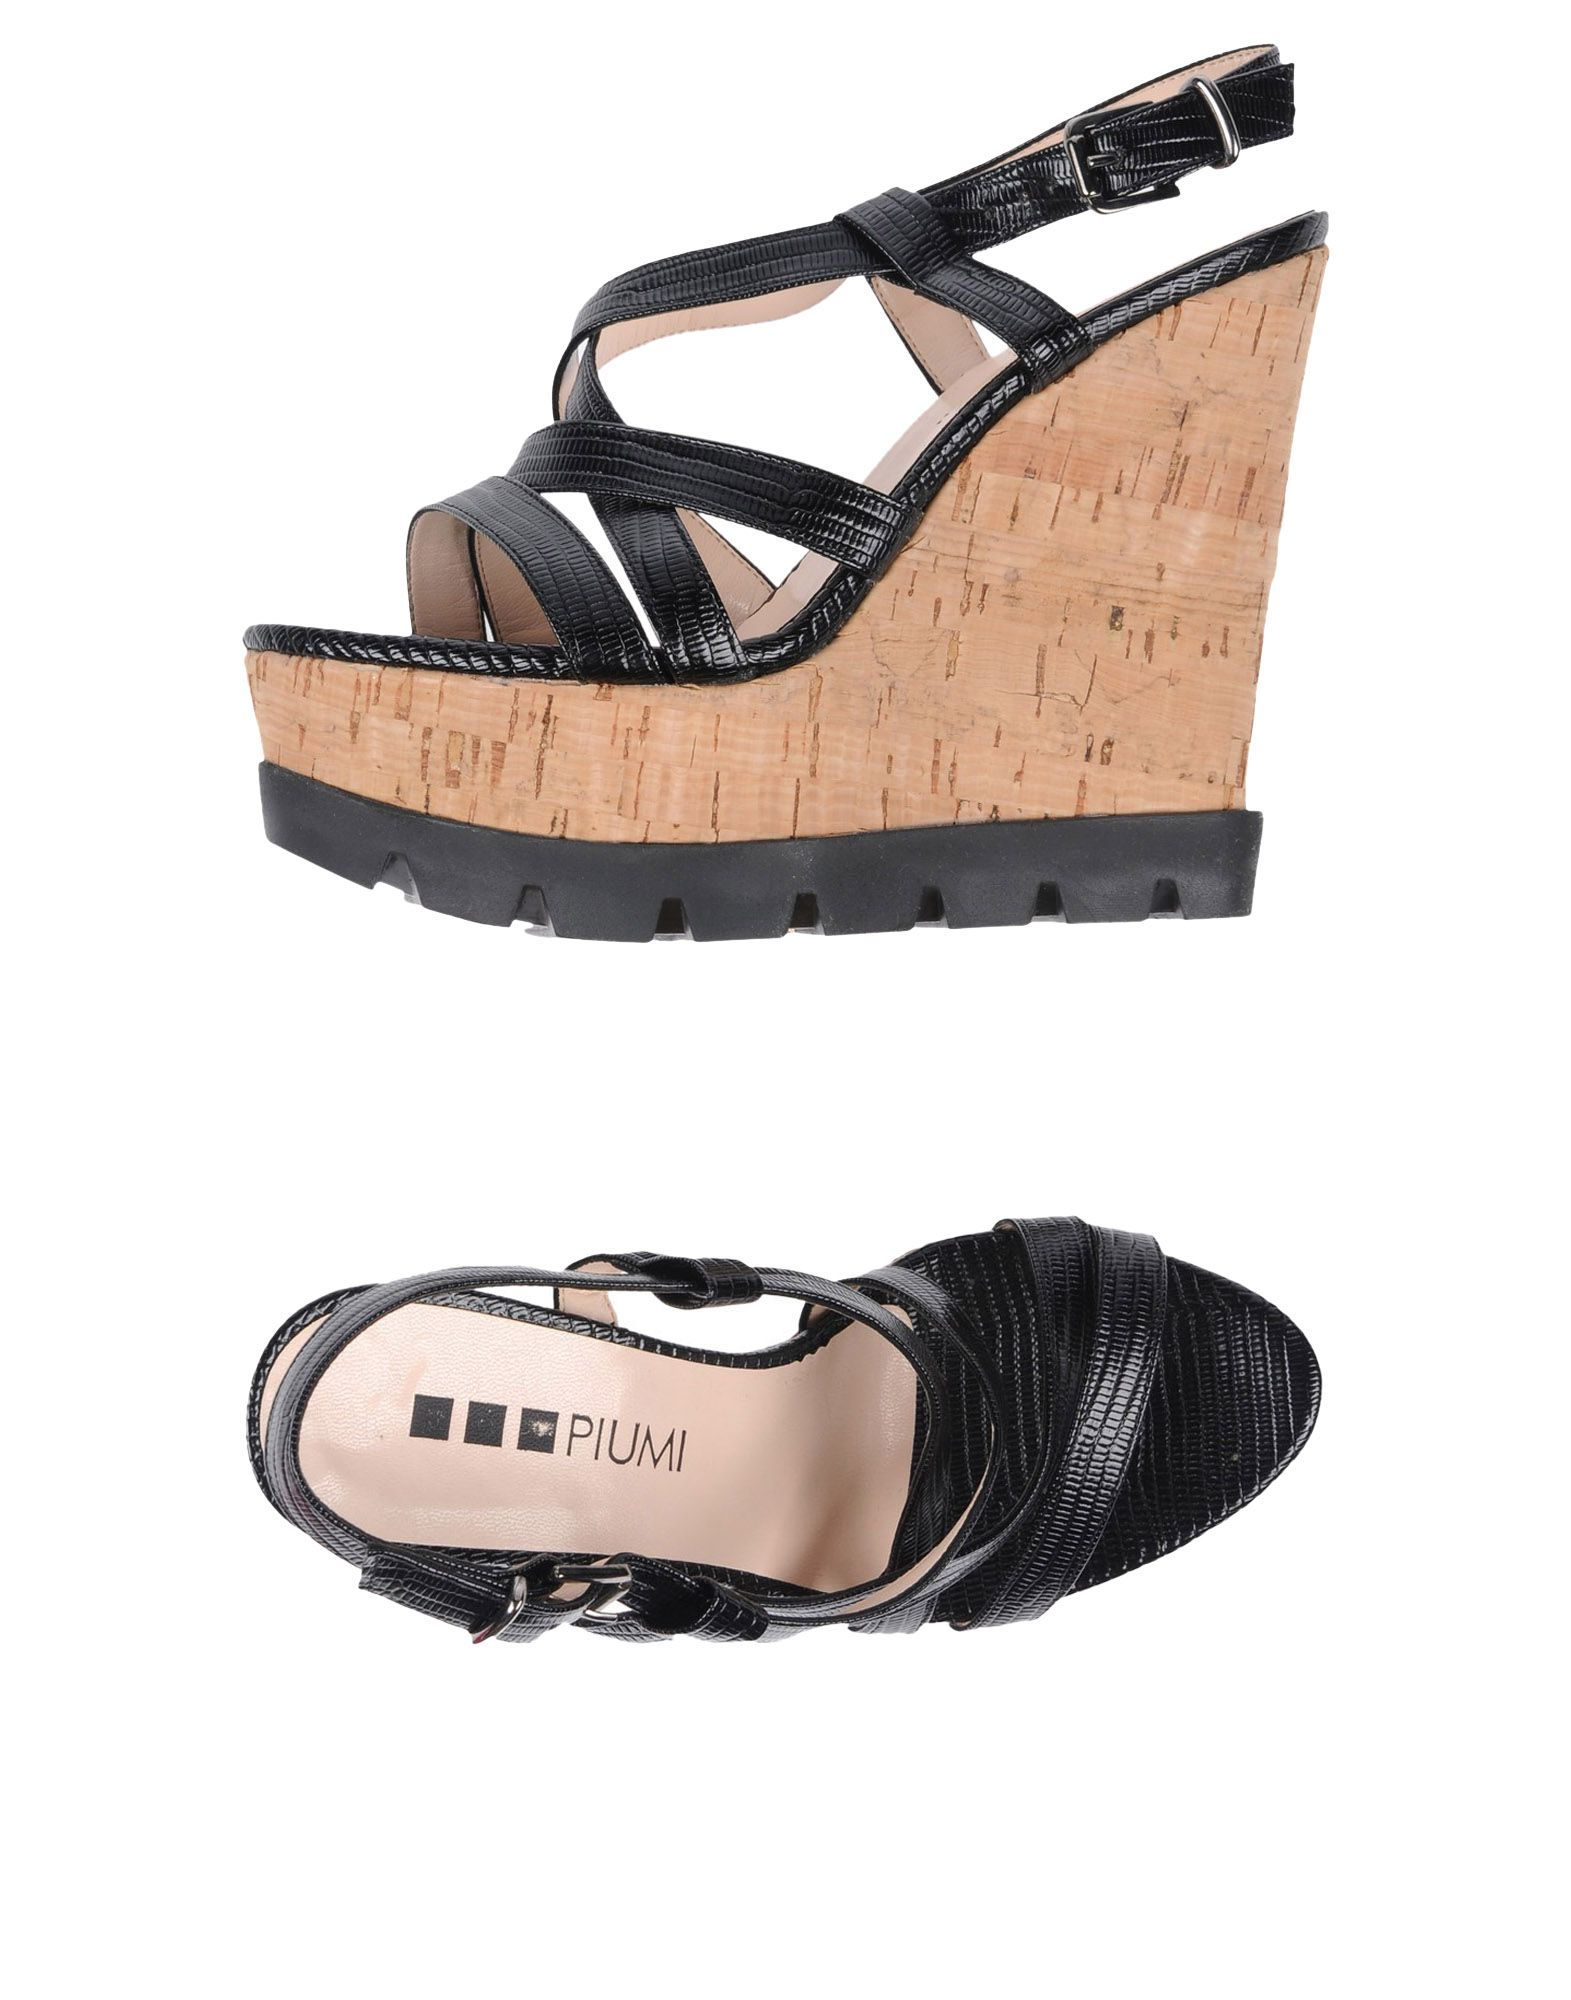 Piumi Sandalen Damen  11458030LR Gute Qualität beliebte Schuhe